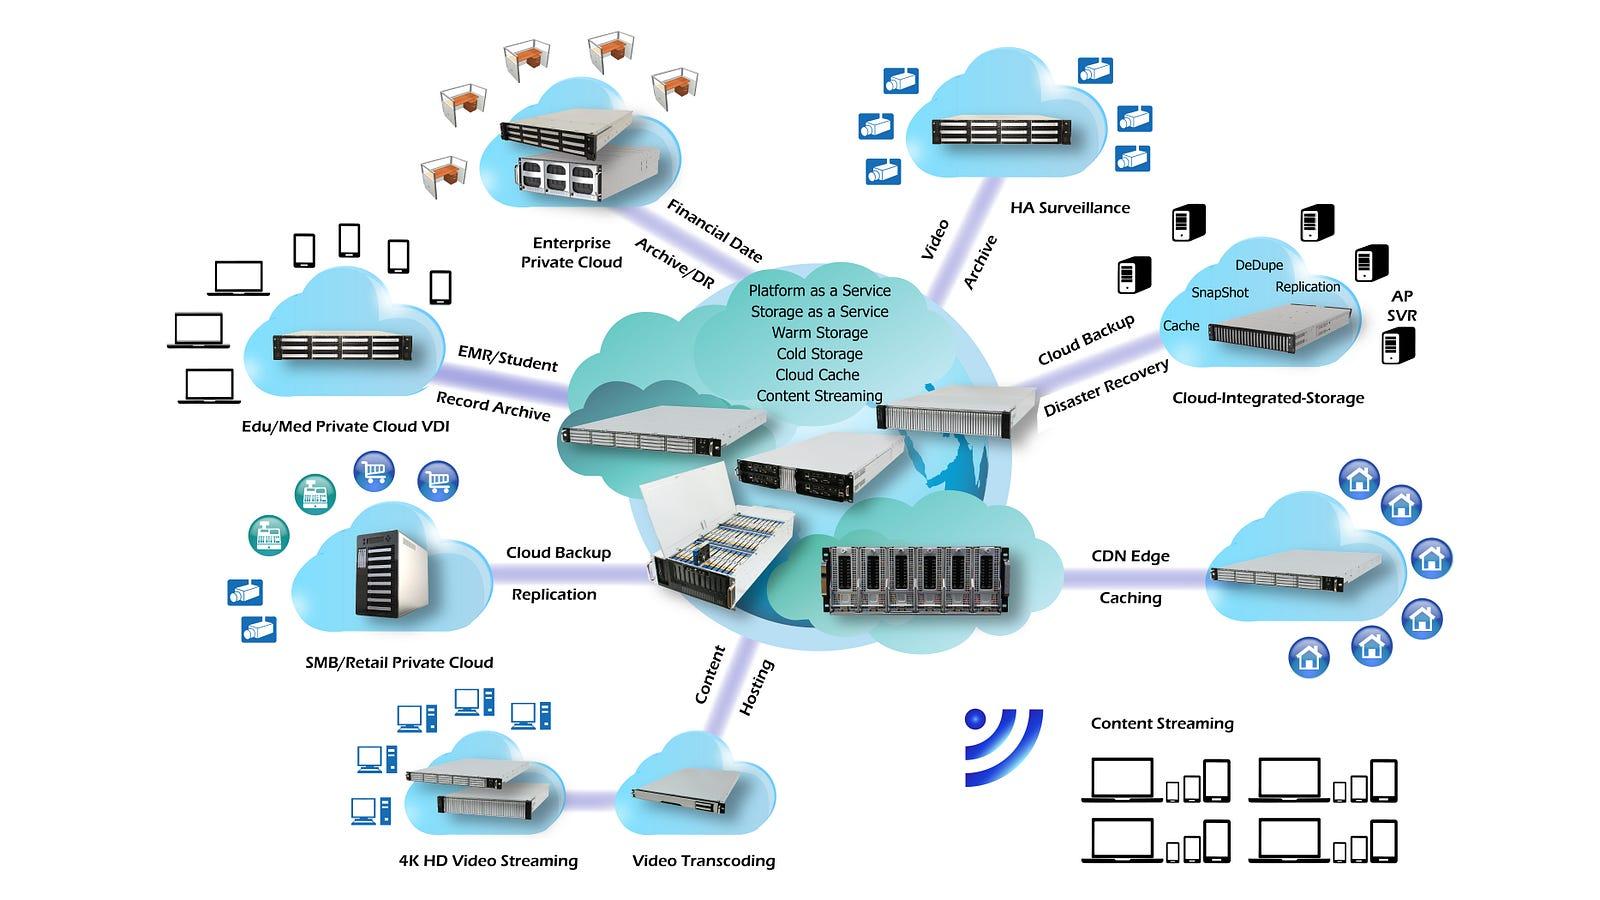 online document storage that works on education queensland network